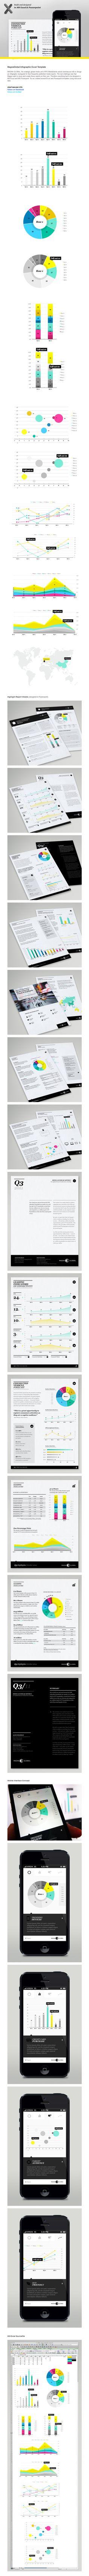 MagnaGlobal Infographic Excel Template / Martin Oberhäuser